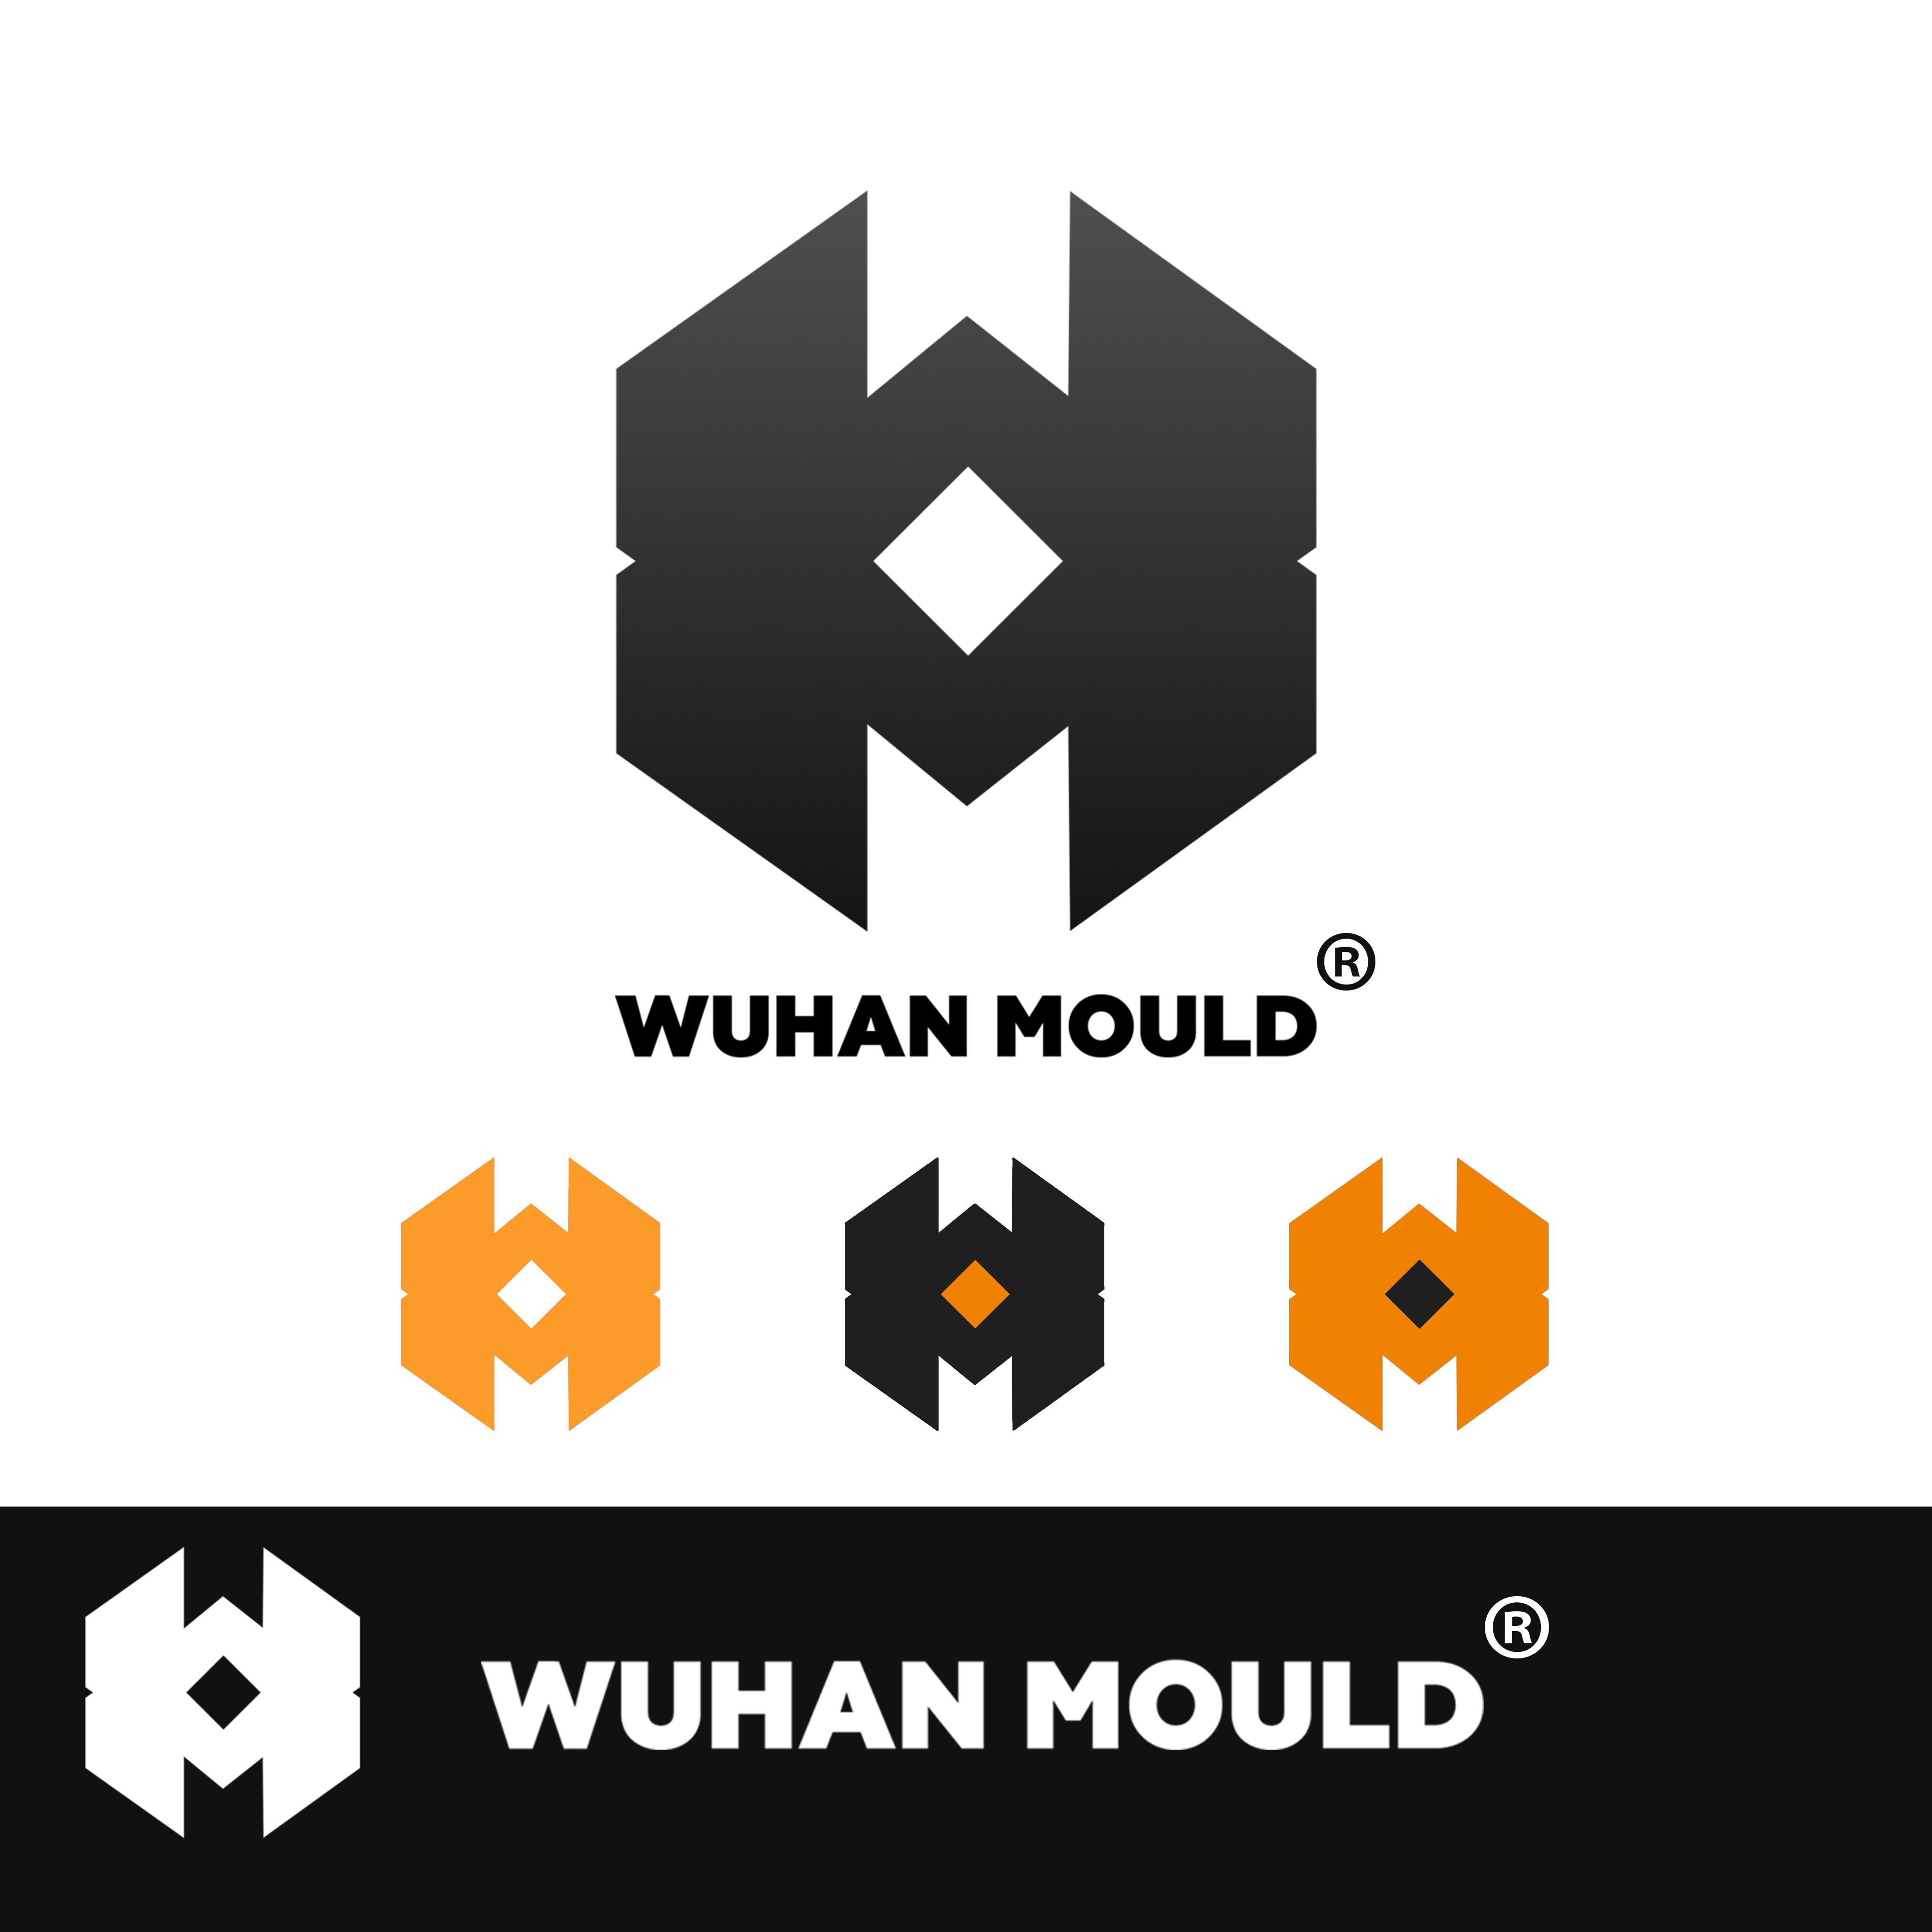 Создать логотип для фабрики пресс-форм фото f_9225989d1db9eed0.jpg